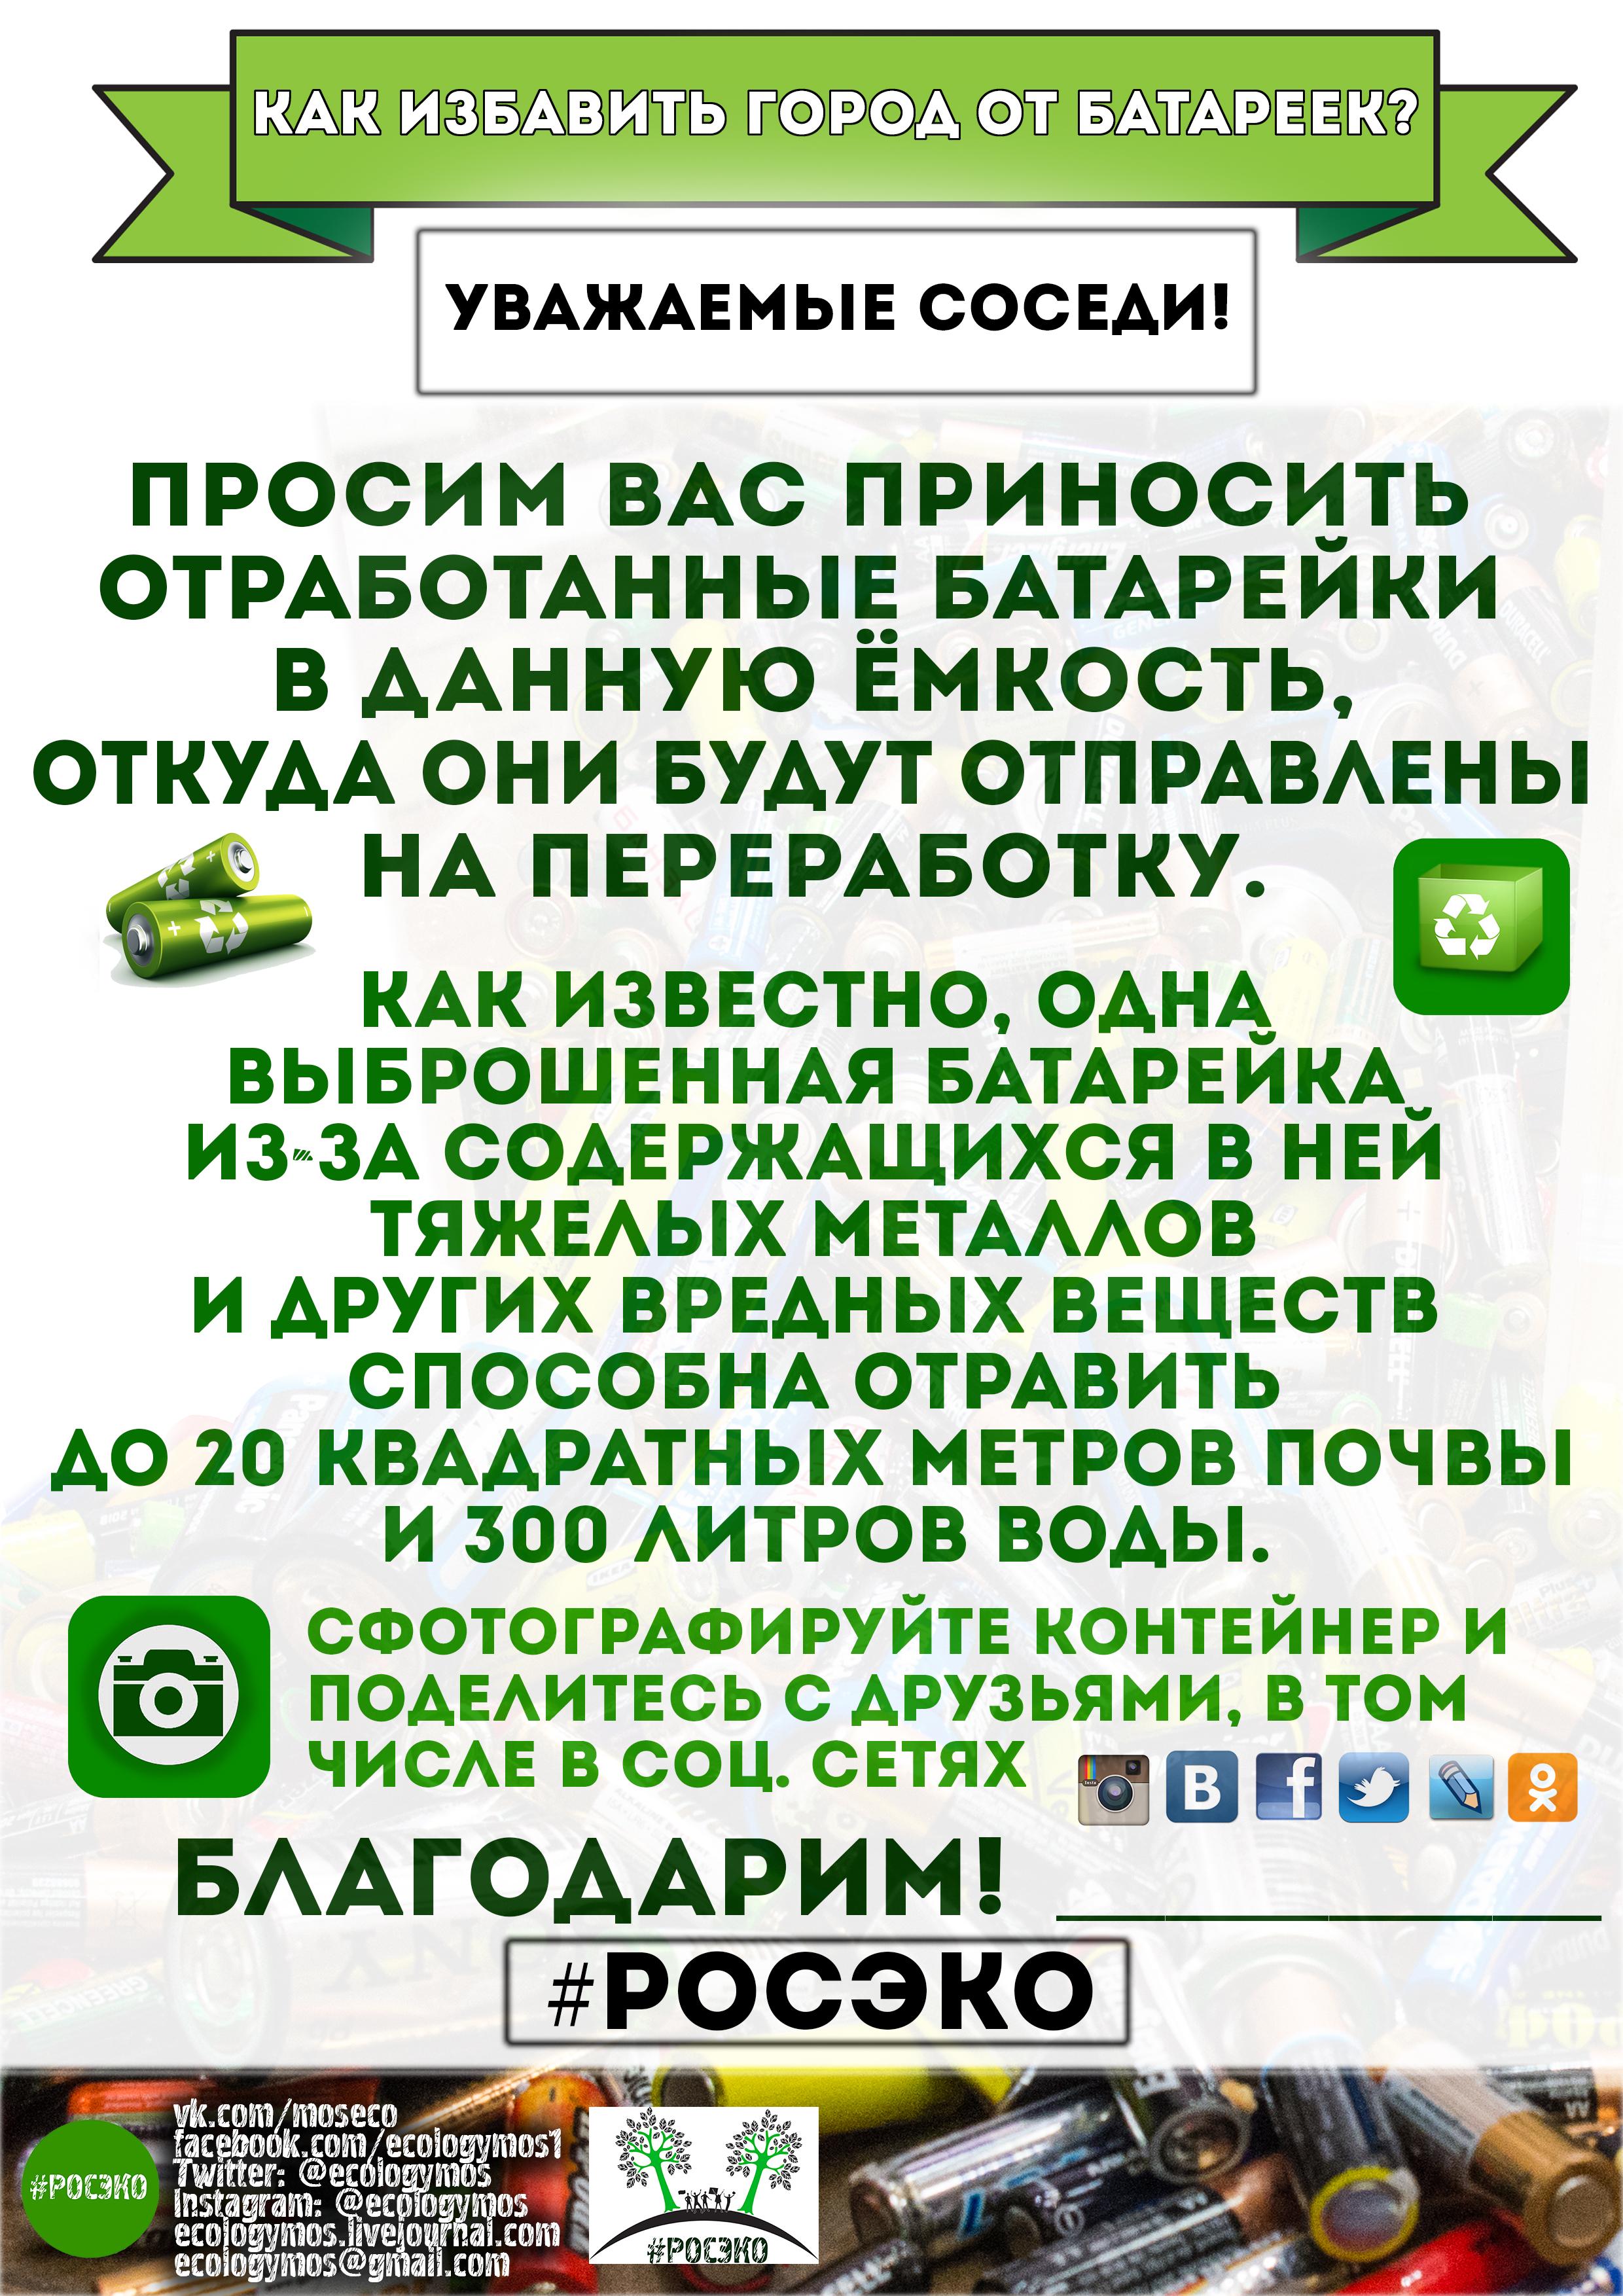 obyava_batareyki_new_ros